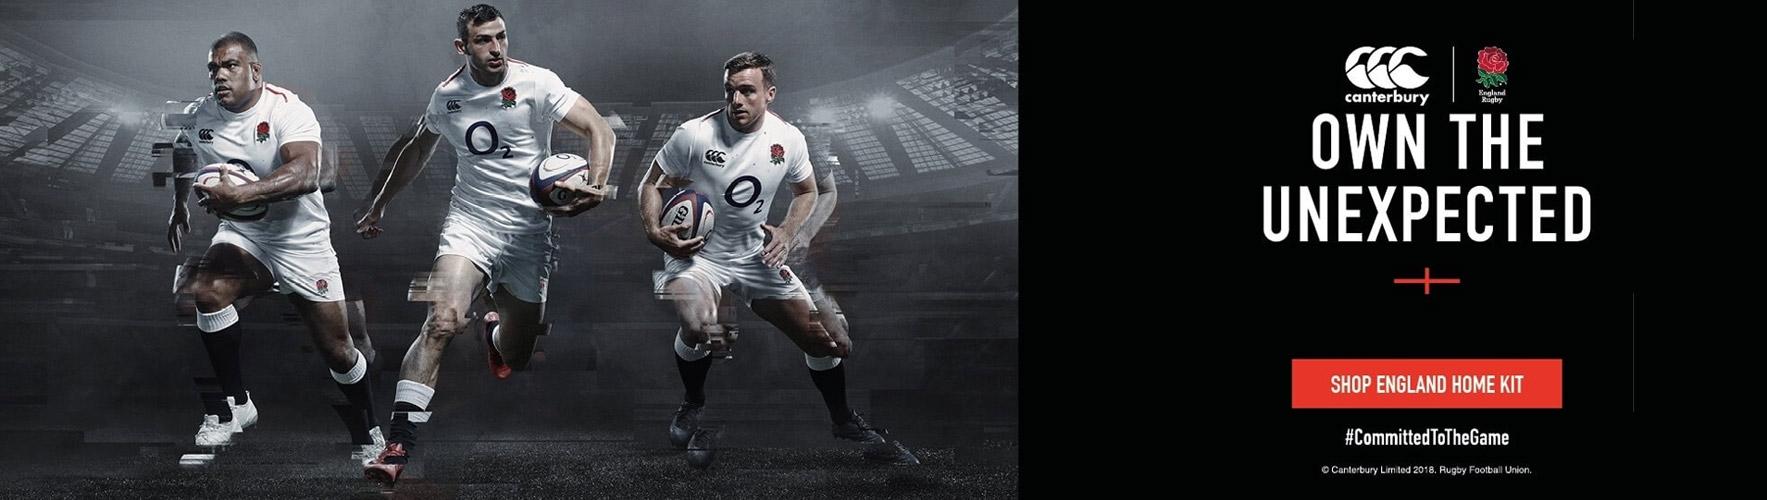 Shop England Rugby Replica 2019 Range